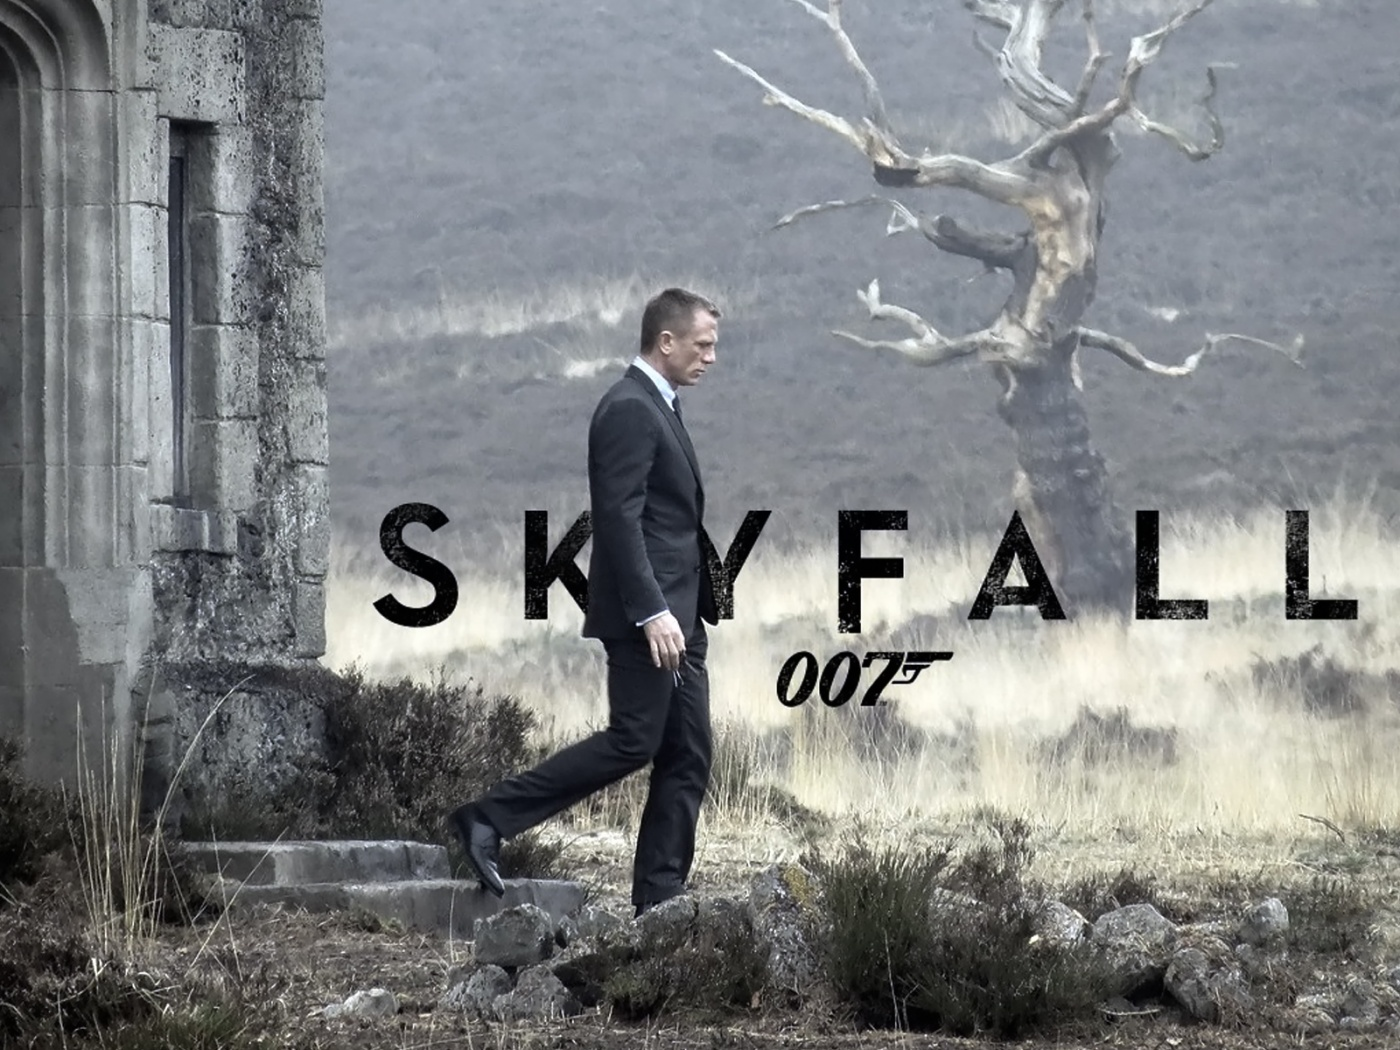 http://3.bp.blogspot.com/-ItdMy6HrebE/UKRusUGLI4I/AAAAAAAAAtM/Rm9HKQR7SMo/s1600/Skyfall+wallpaper04.jpg